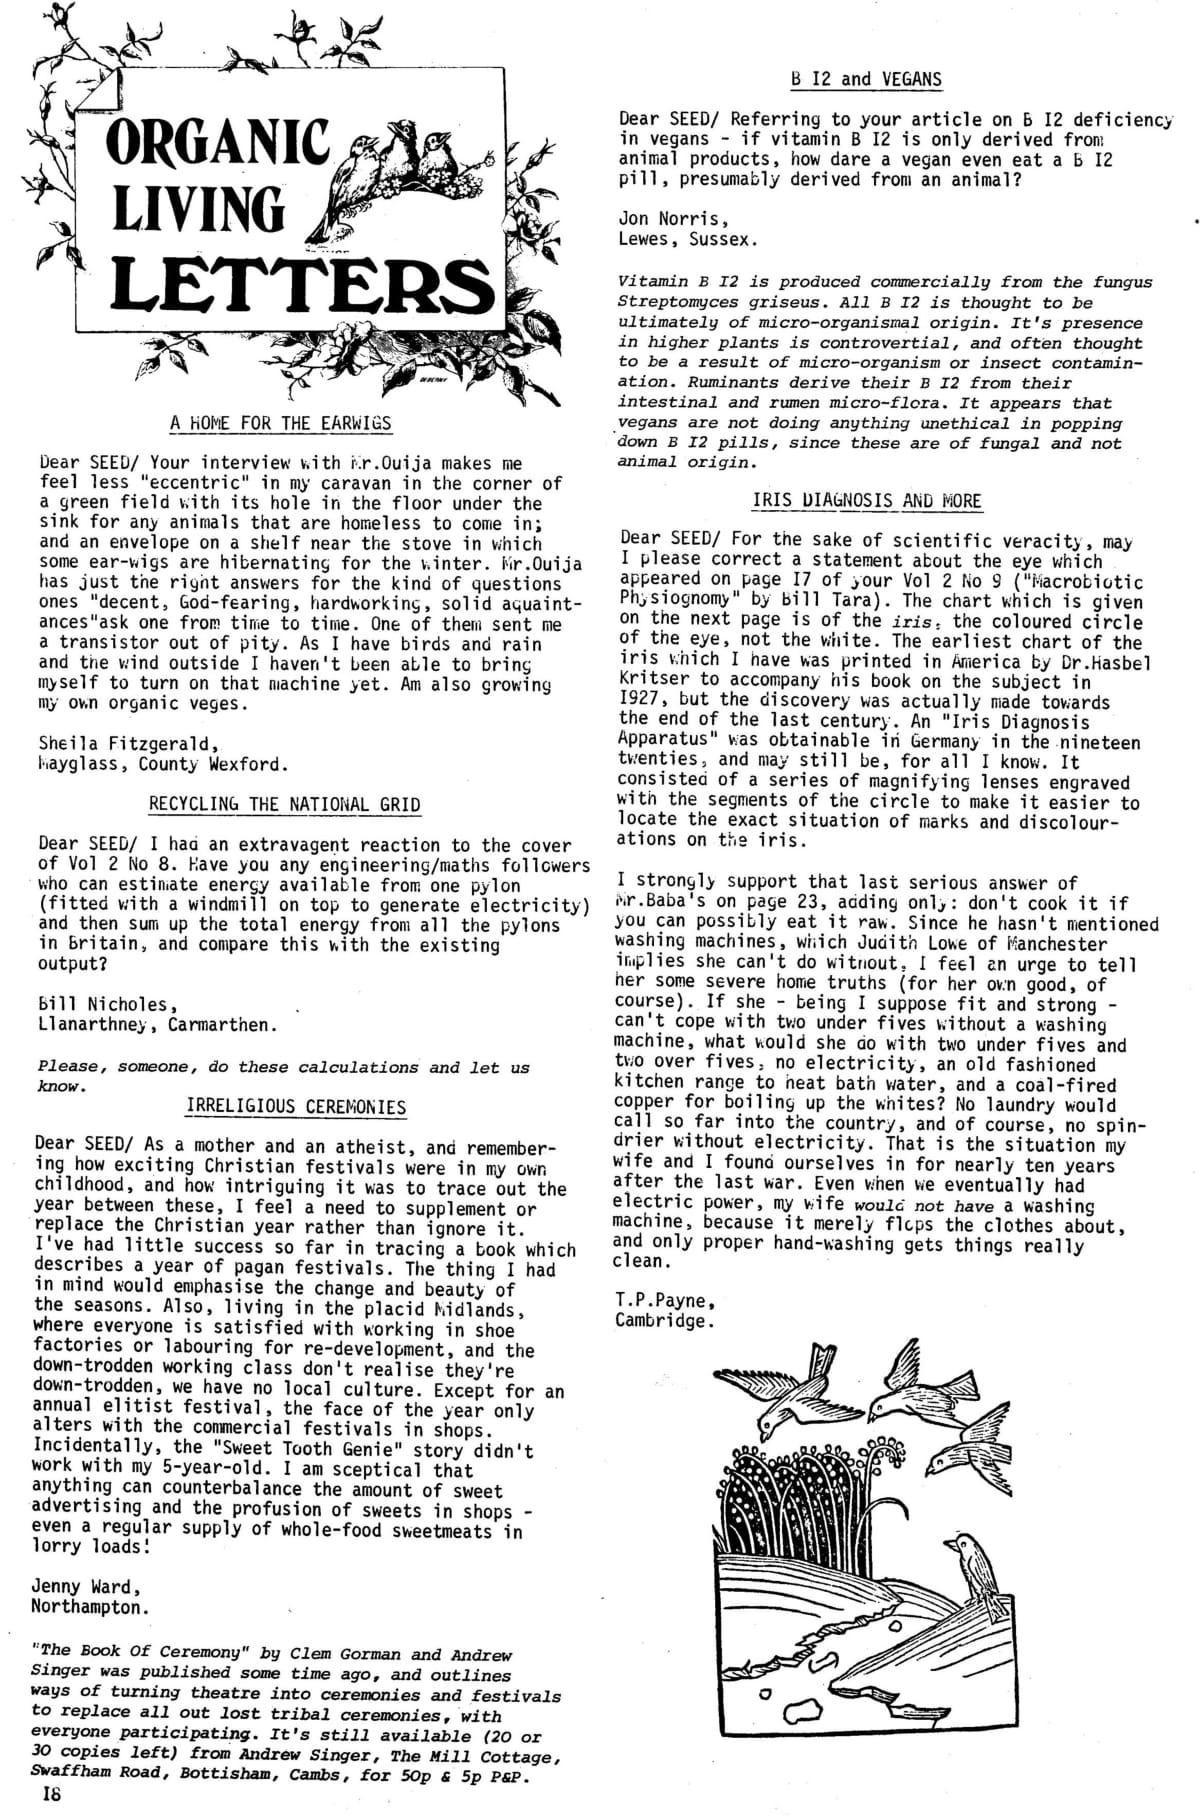 seed-v3-n1-jan1974-18.jpg